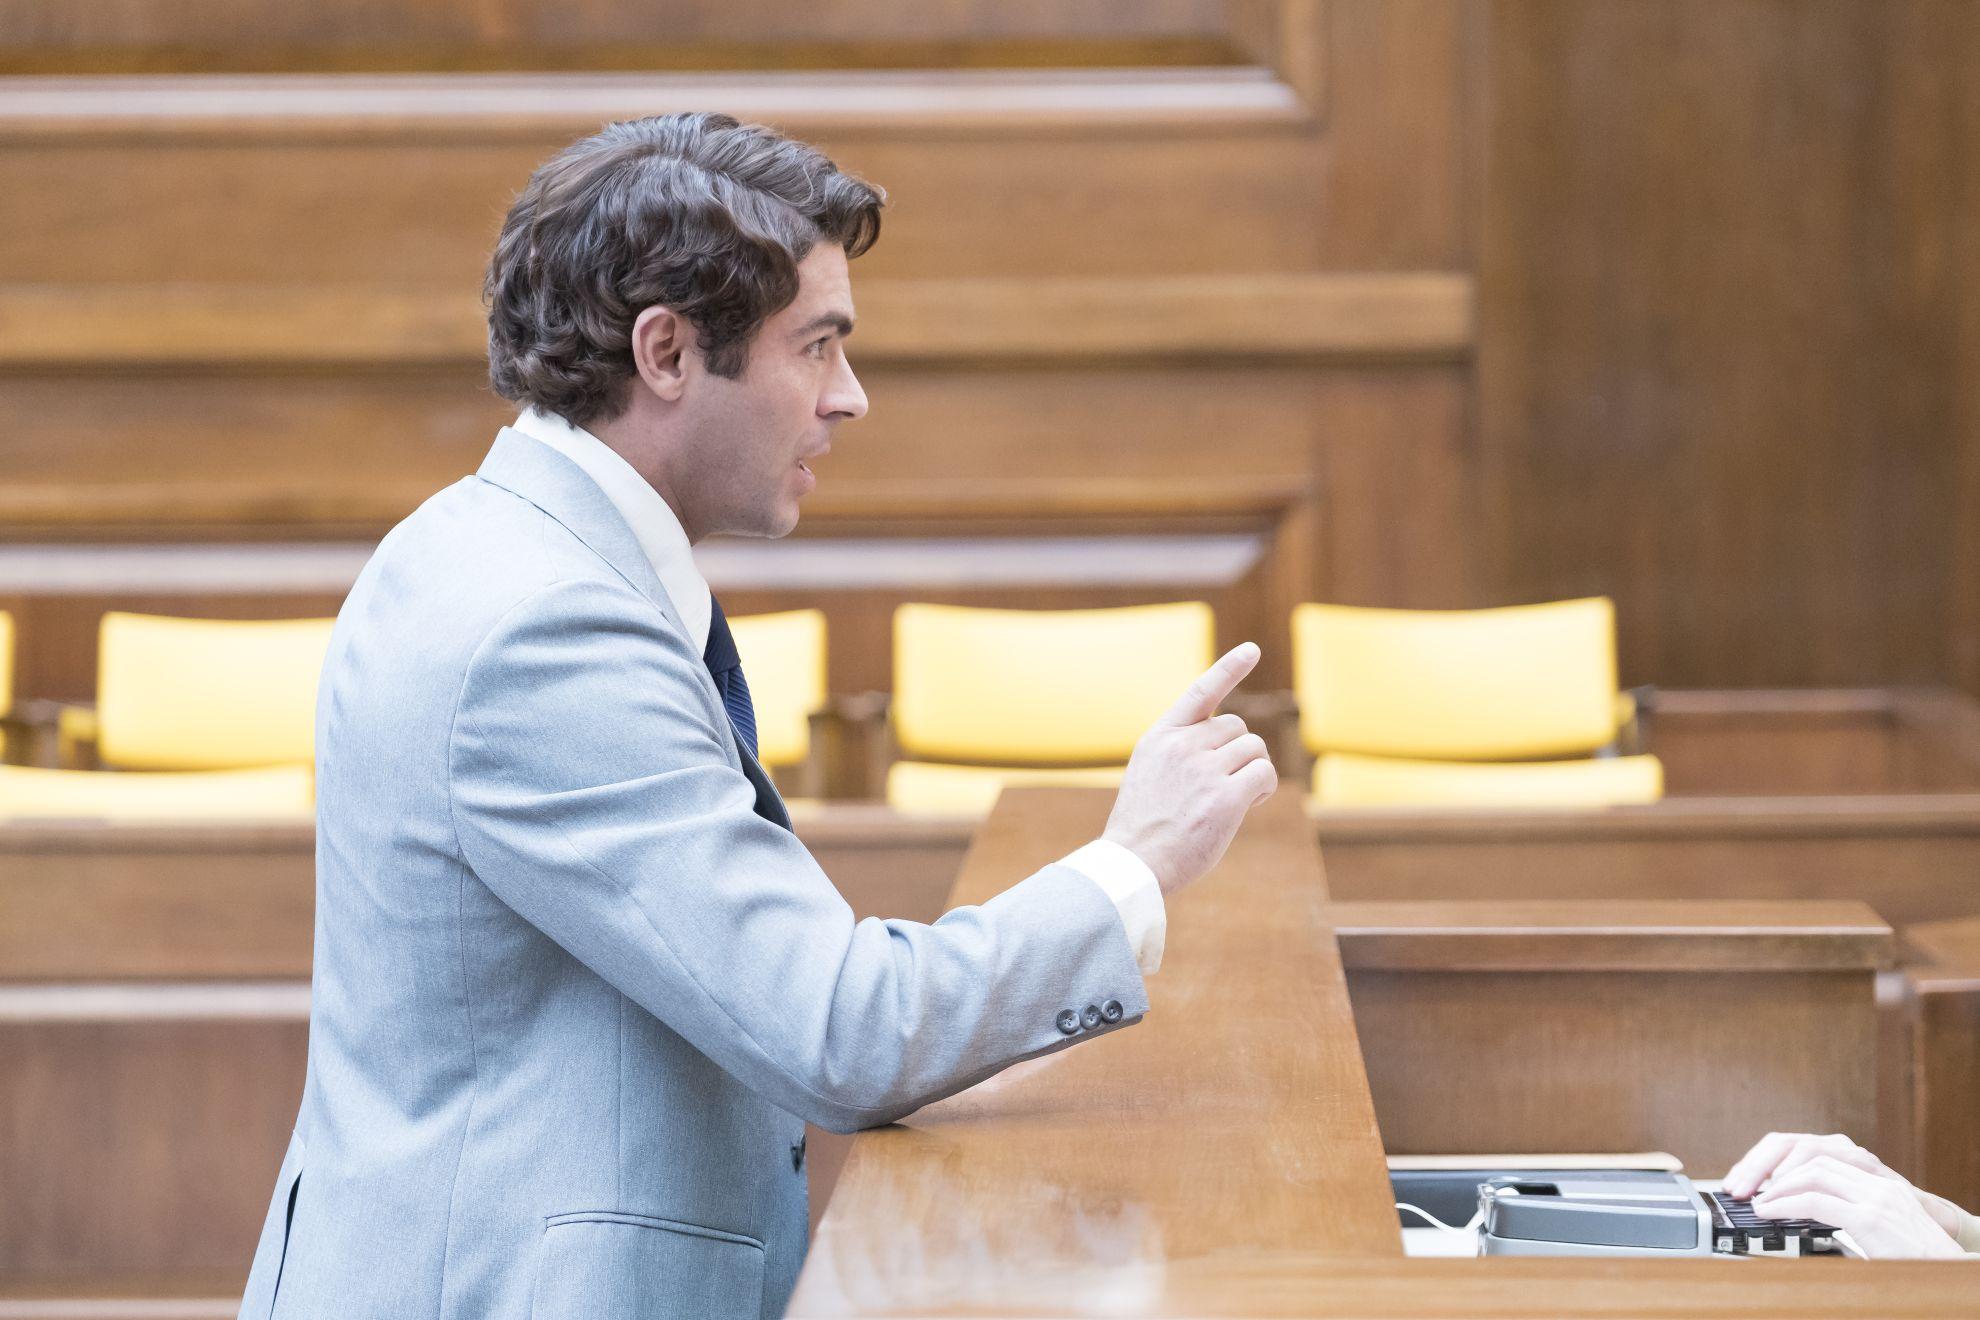 Ted Bundy - Fascino Criminale: Zac Efron interpreta Ted Bundy in una scena del processo